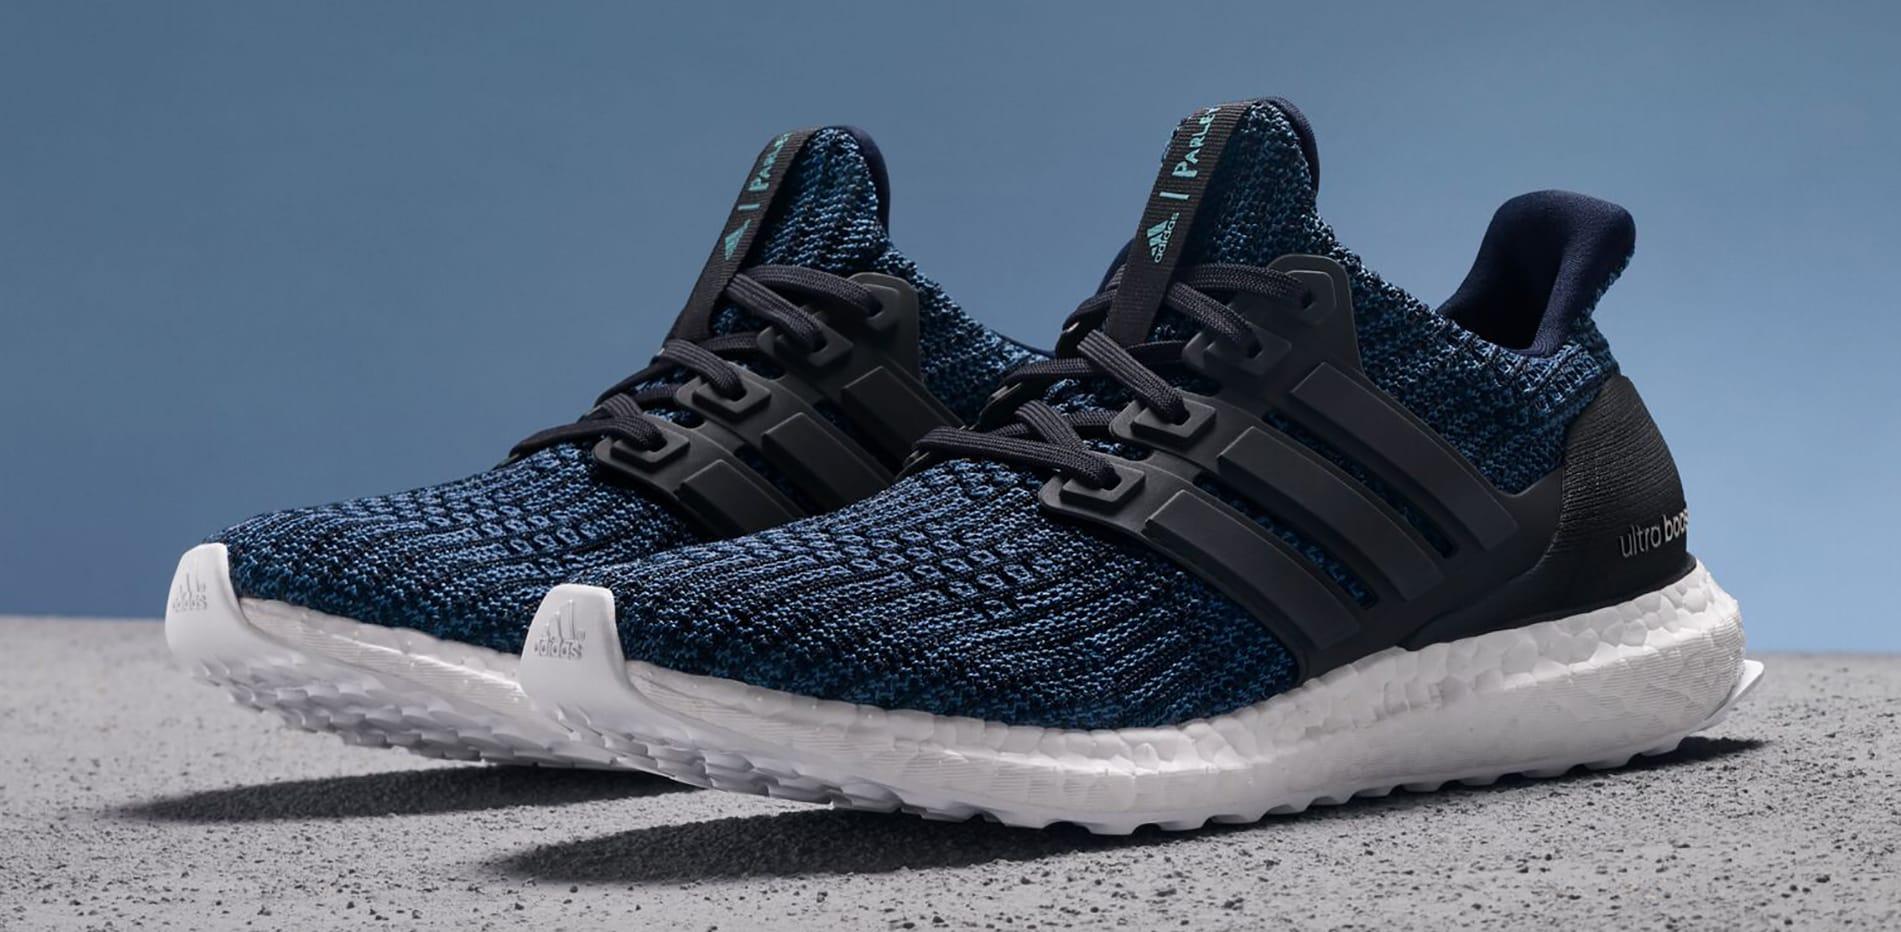 Parley x Adidas Ultra Boost 'Deep Ocean Blue'